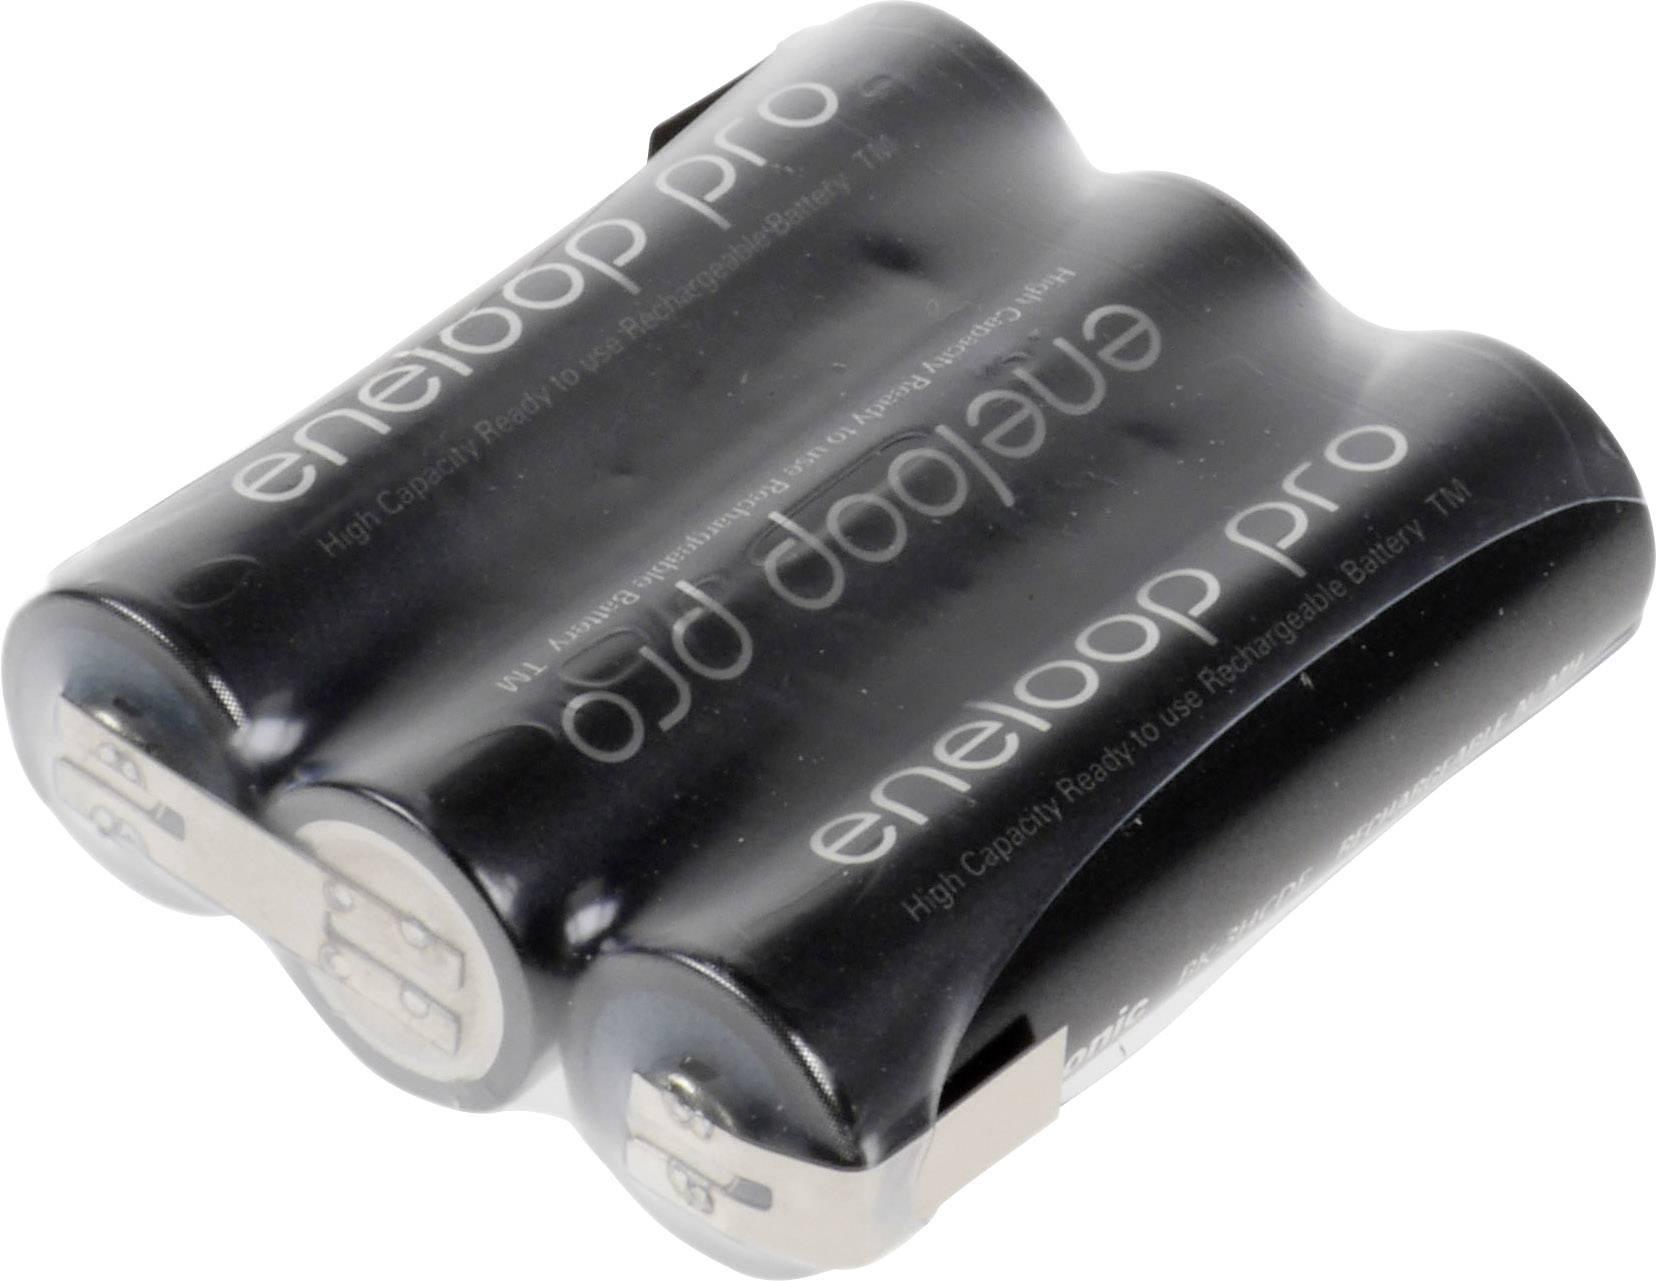 Akupack - sada nabíjacích batérií NiMH 3 mignon (AA) Panasonic eneloop Pro Reihe F1x3 135551, 2450 mAh, 3.6 V